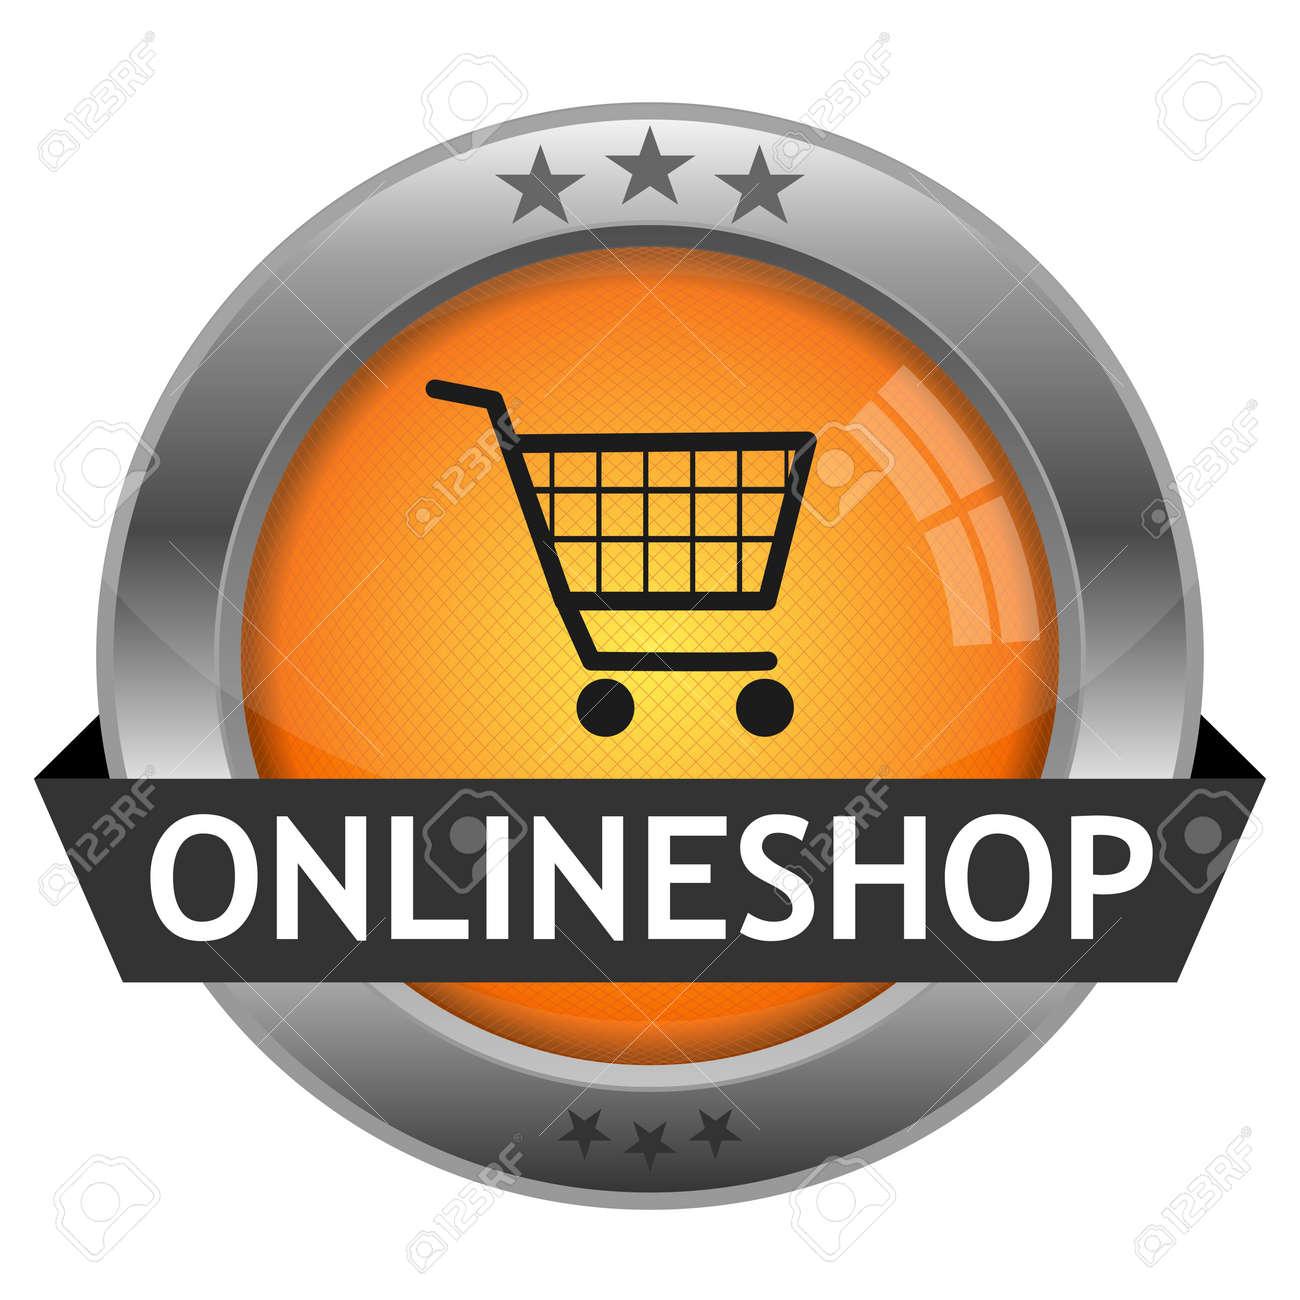 Button Onlineshop Stock Vector - 16528994